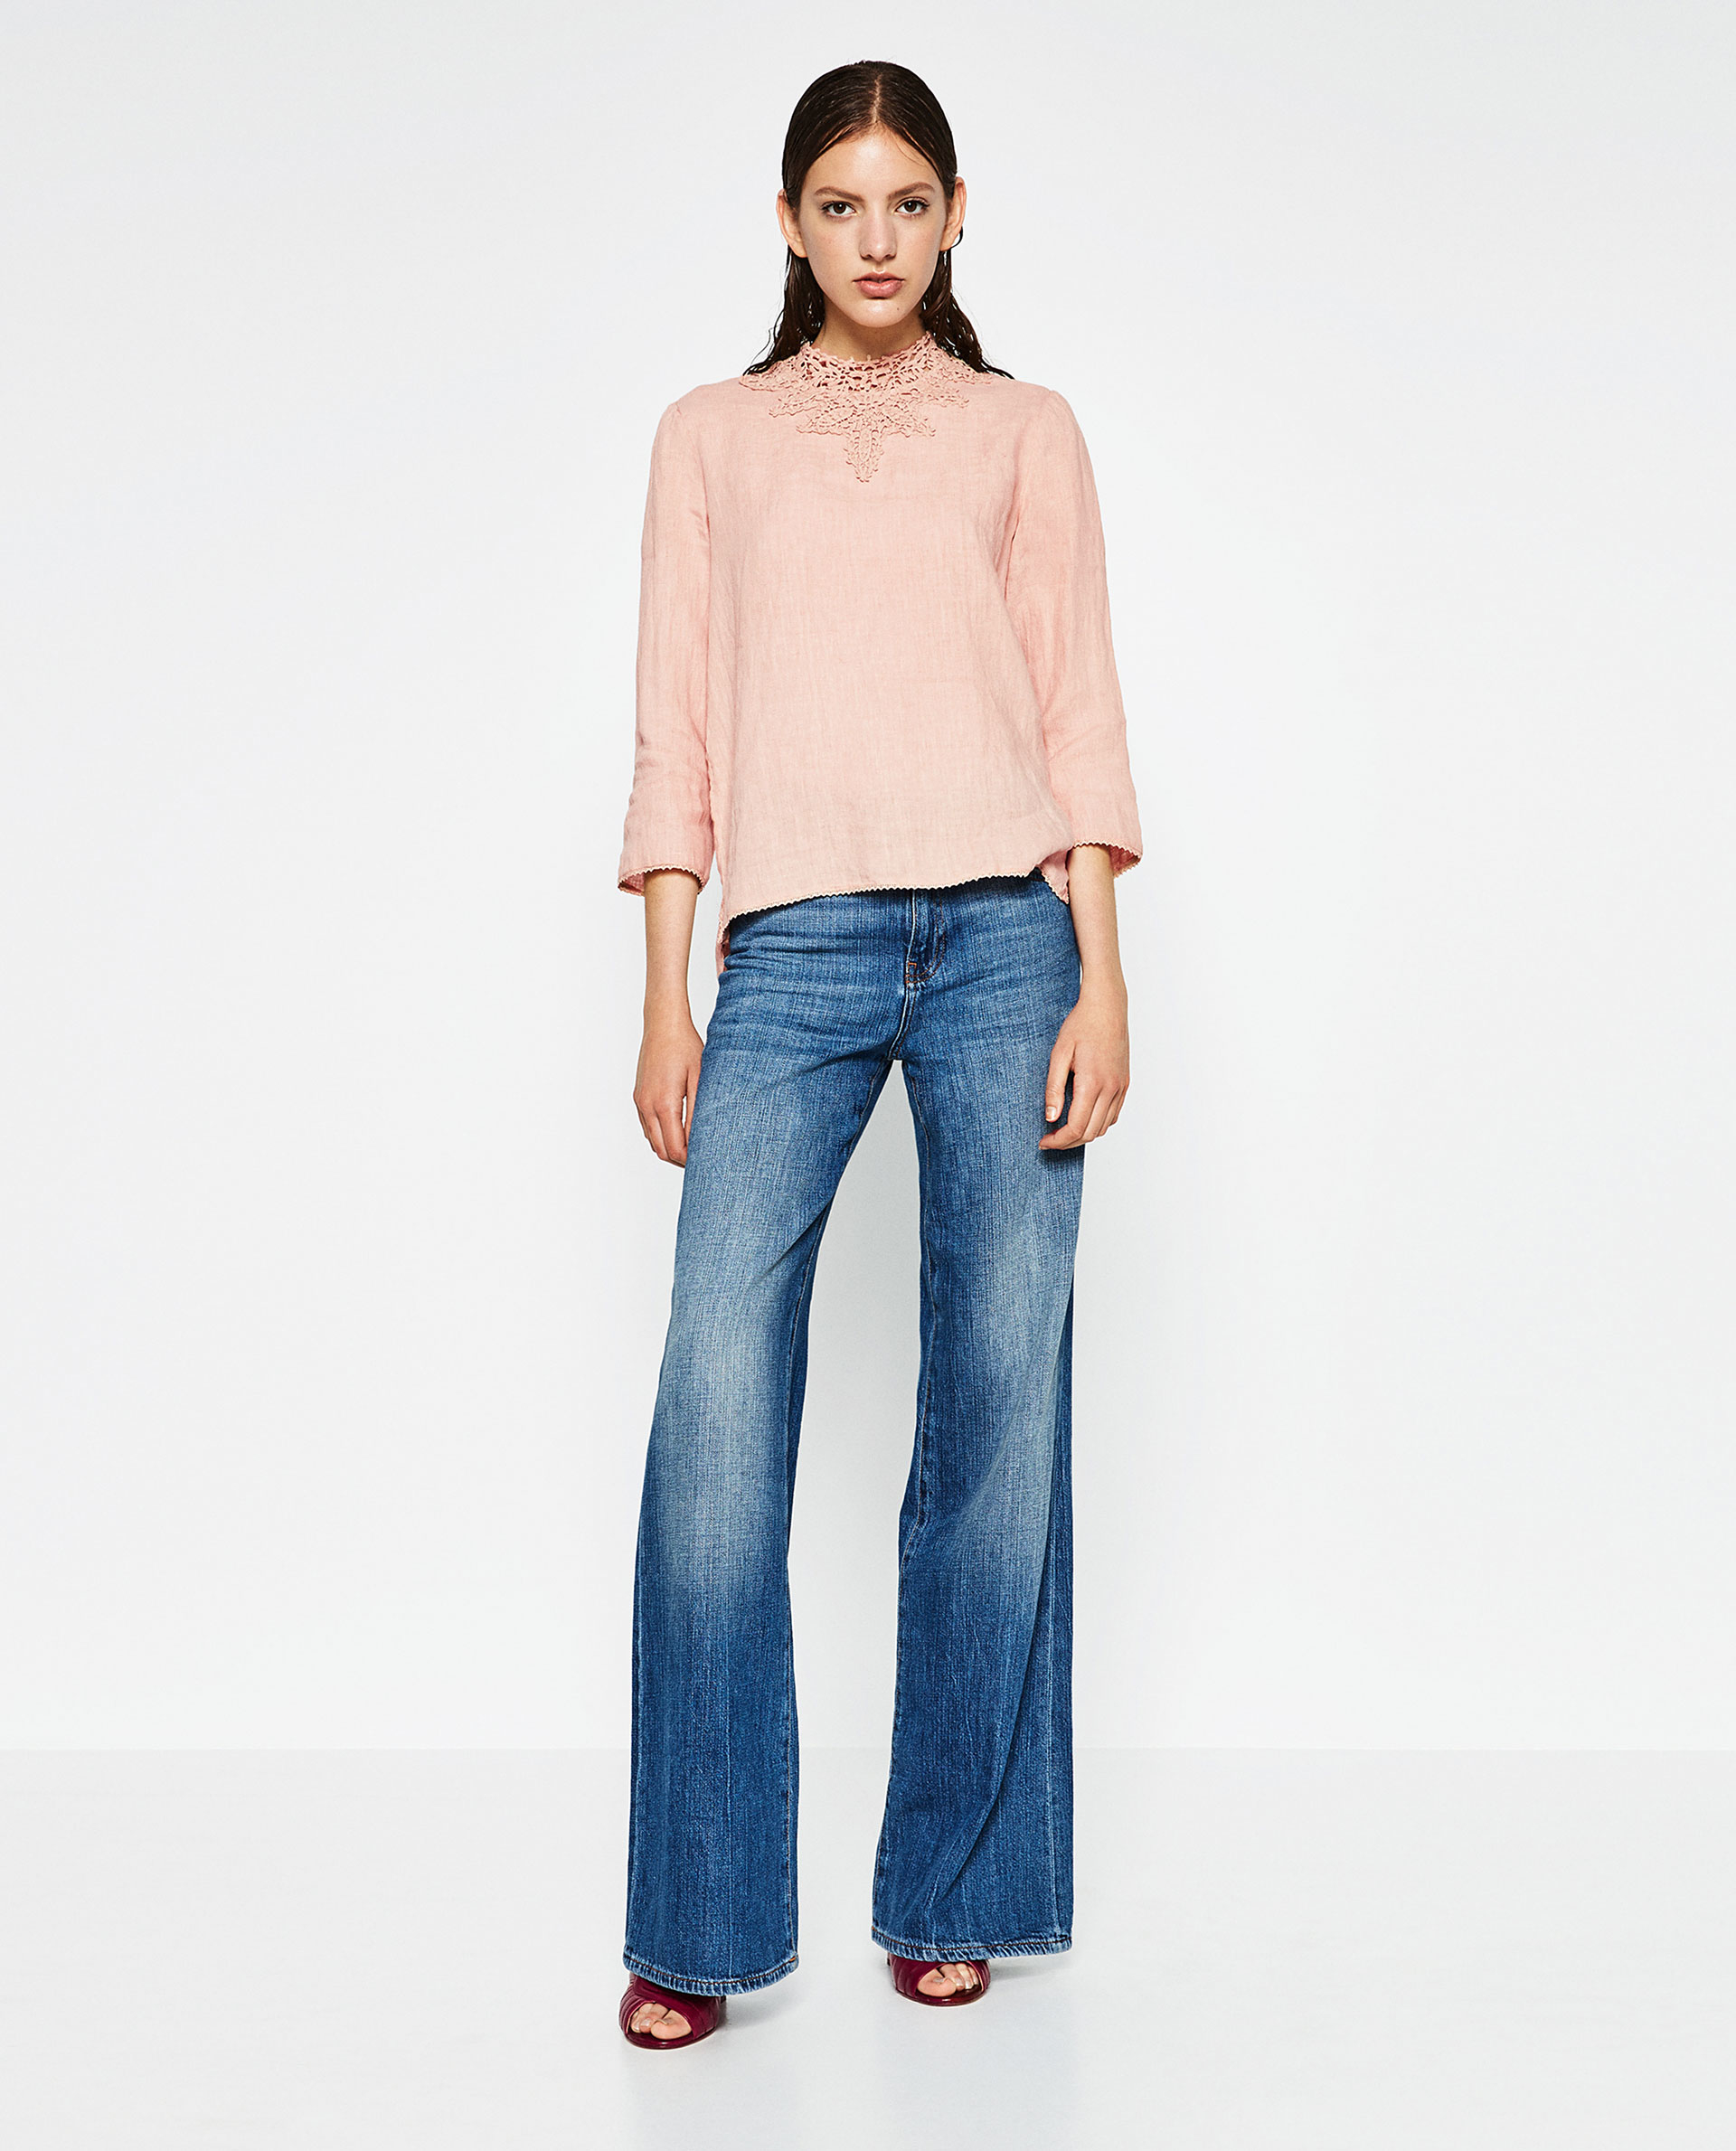 Zara Linen Blouse 87